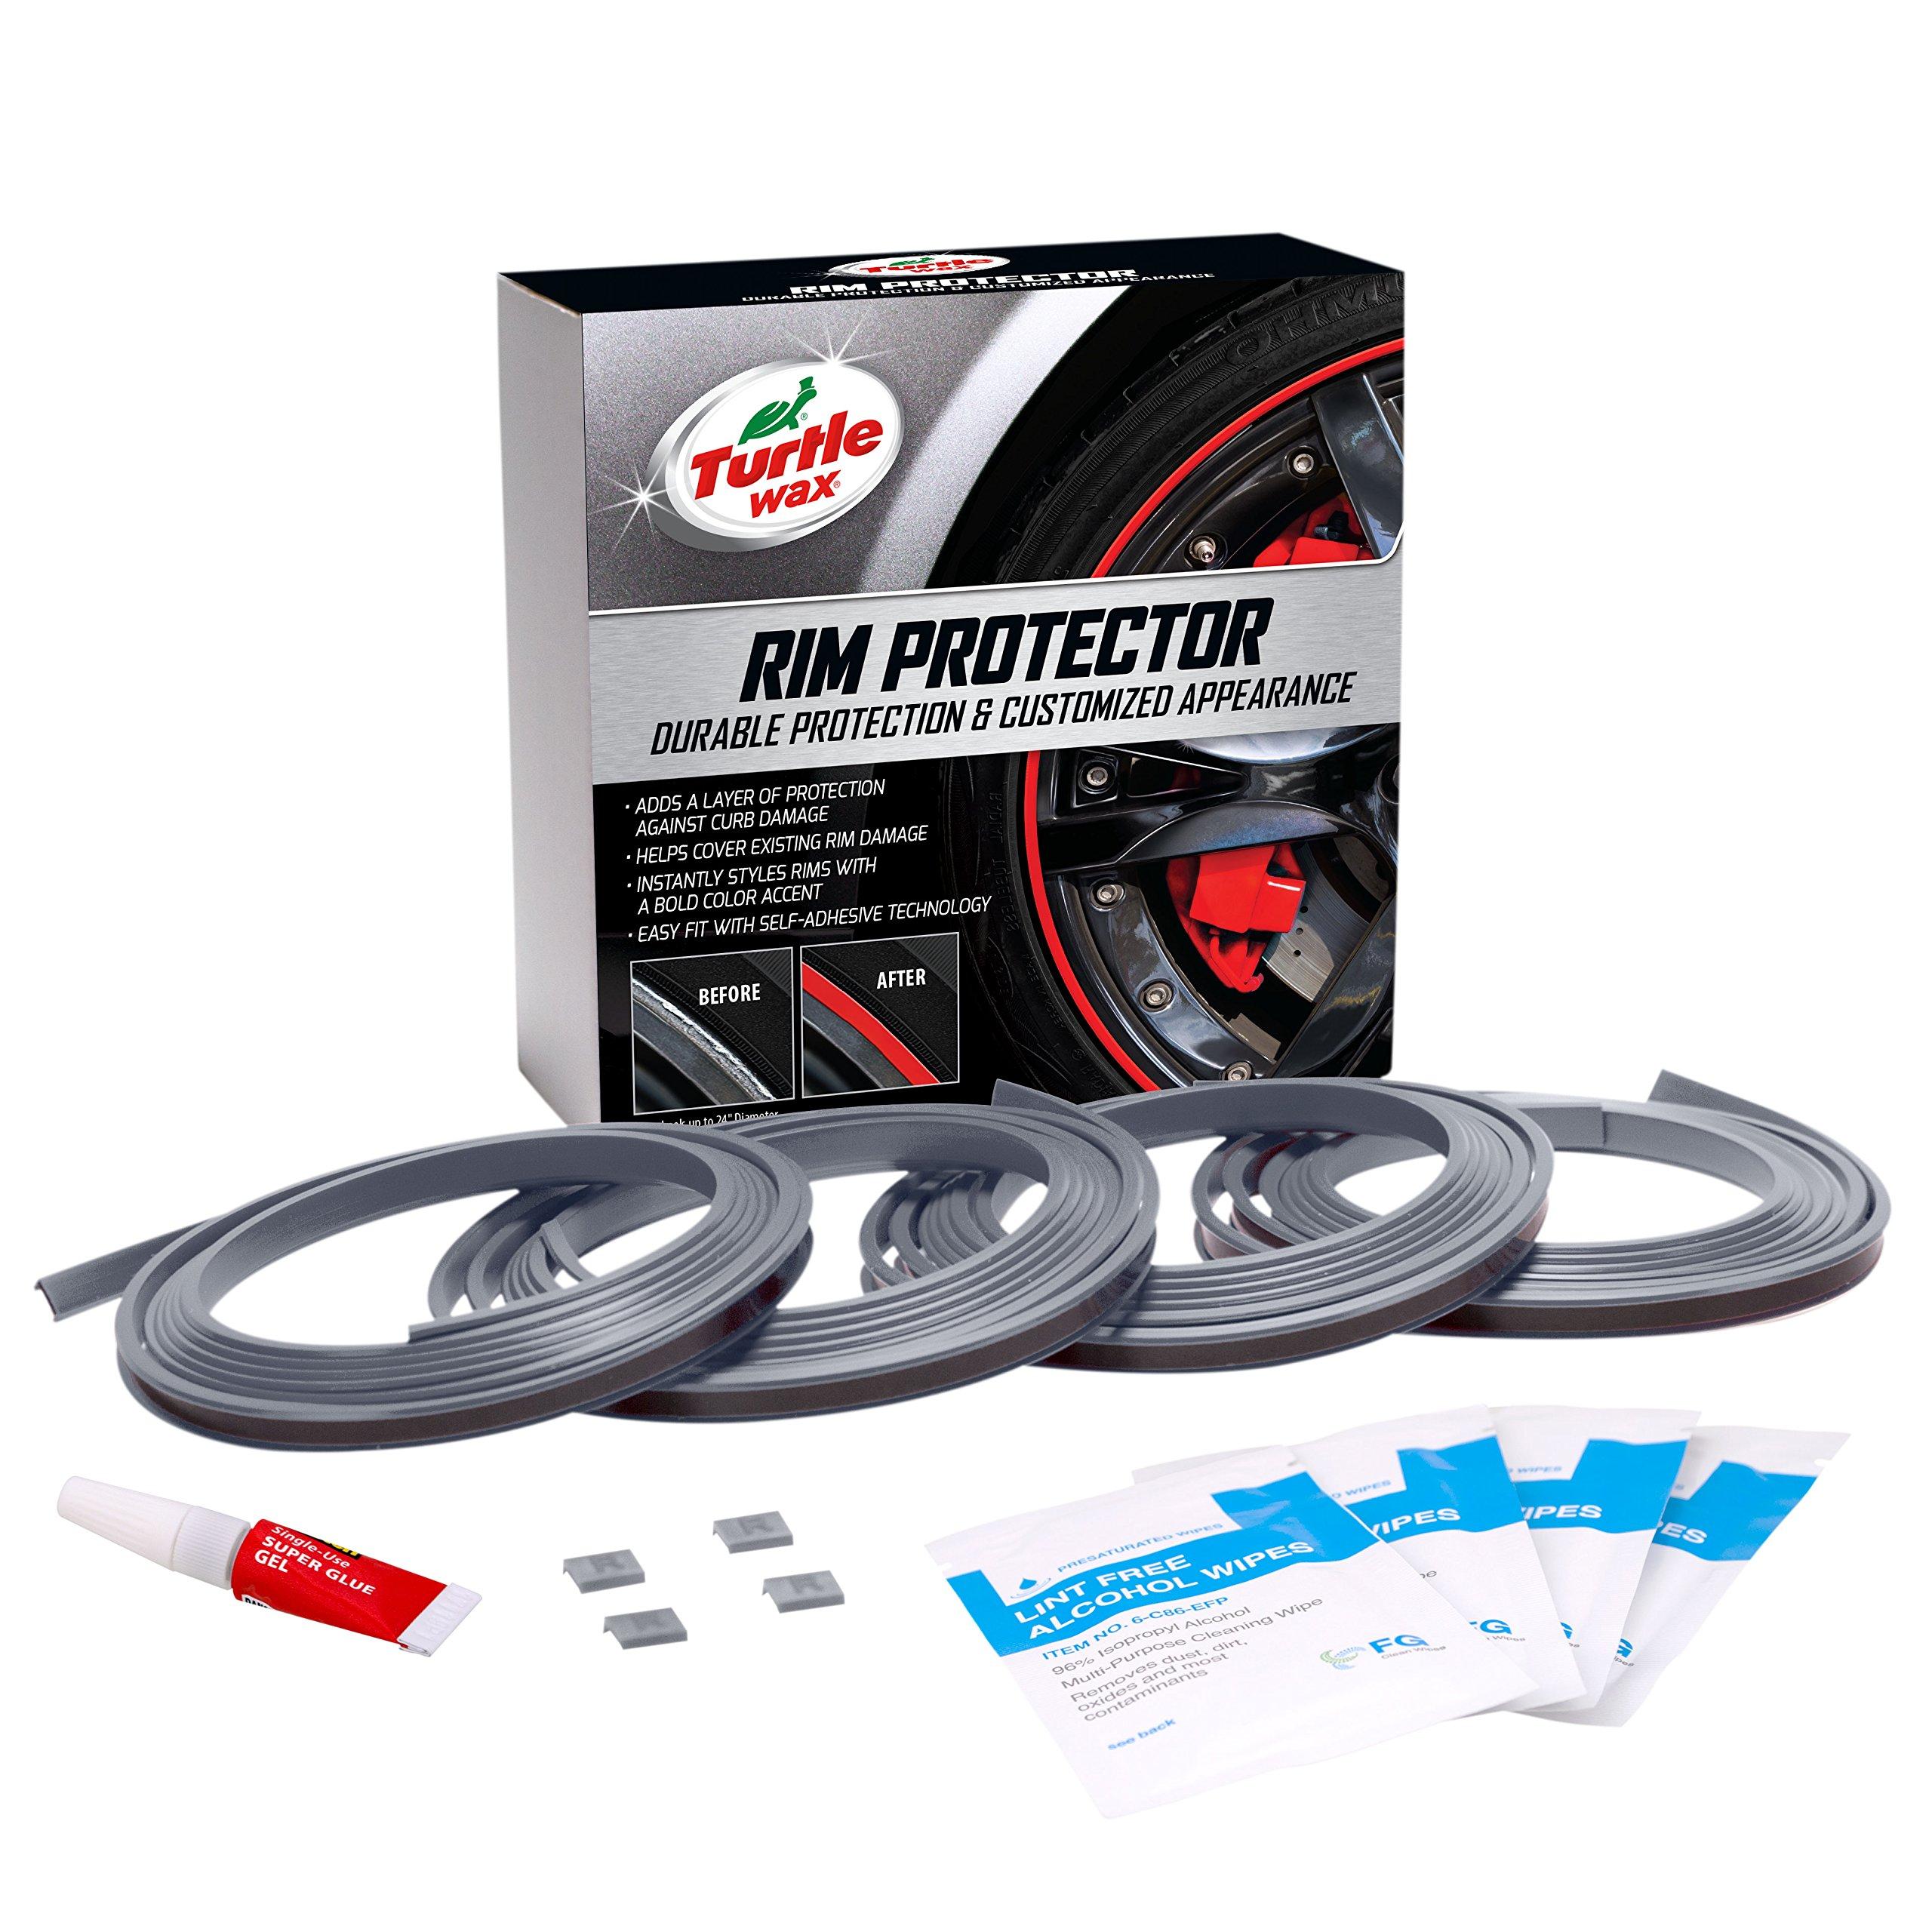 Turtle Wax 50700 Premium Rim Protector (Silver, Set of 4), 4 Pack